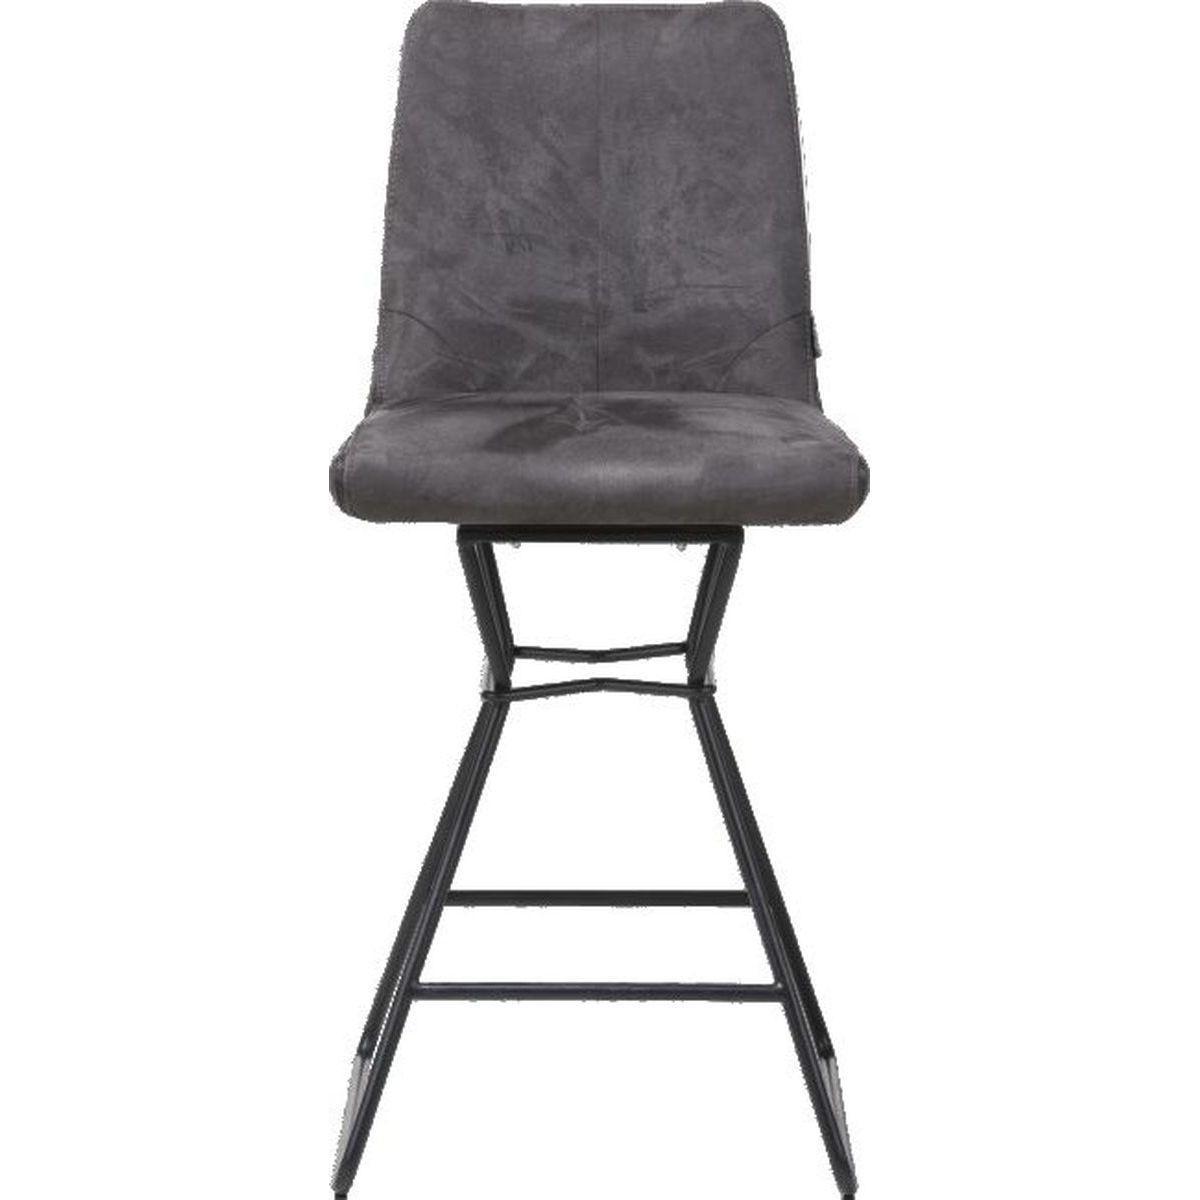 Chaise de bar AIDEN Xooon anthracite